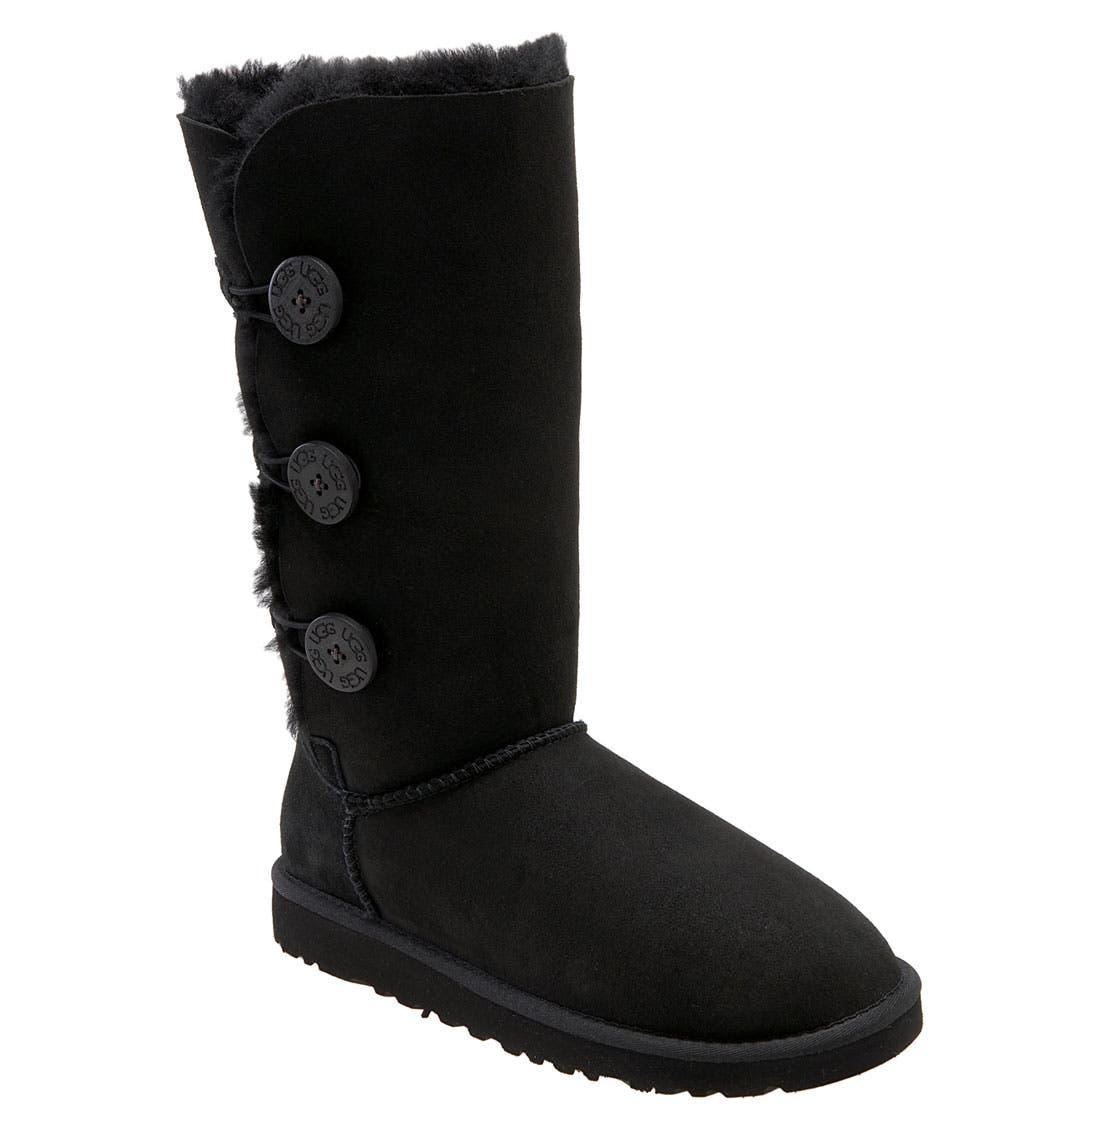 Main Image - UGG® 'Bailey Button Triplet' Boot (Women)